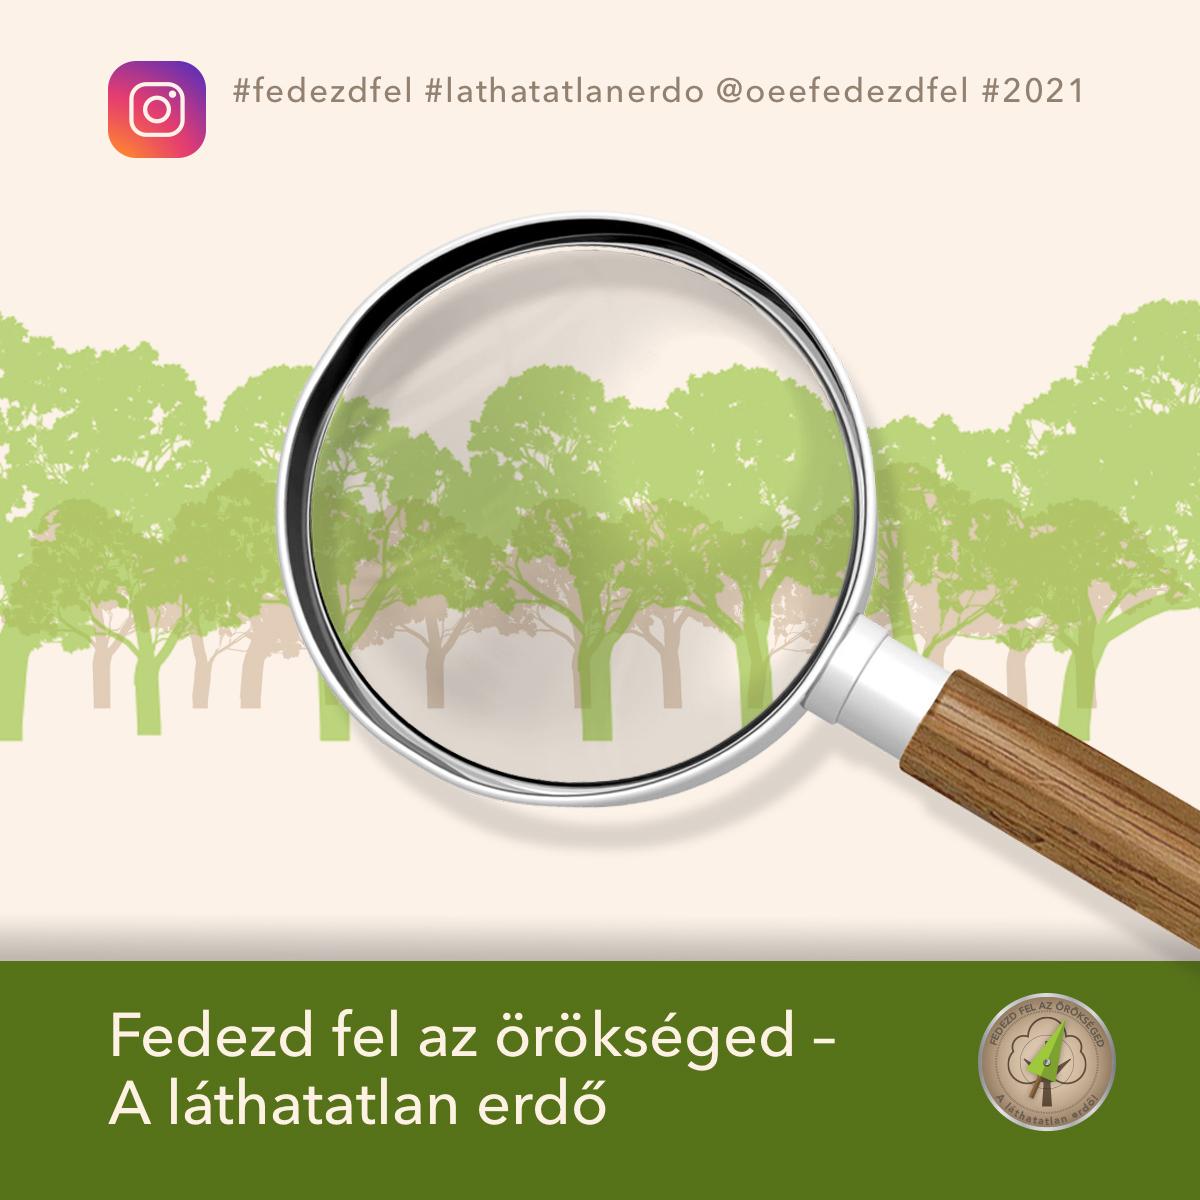 fedezd_fel_2021_Facebook_post_new-1